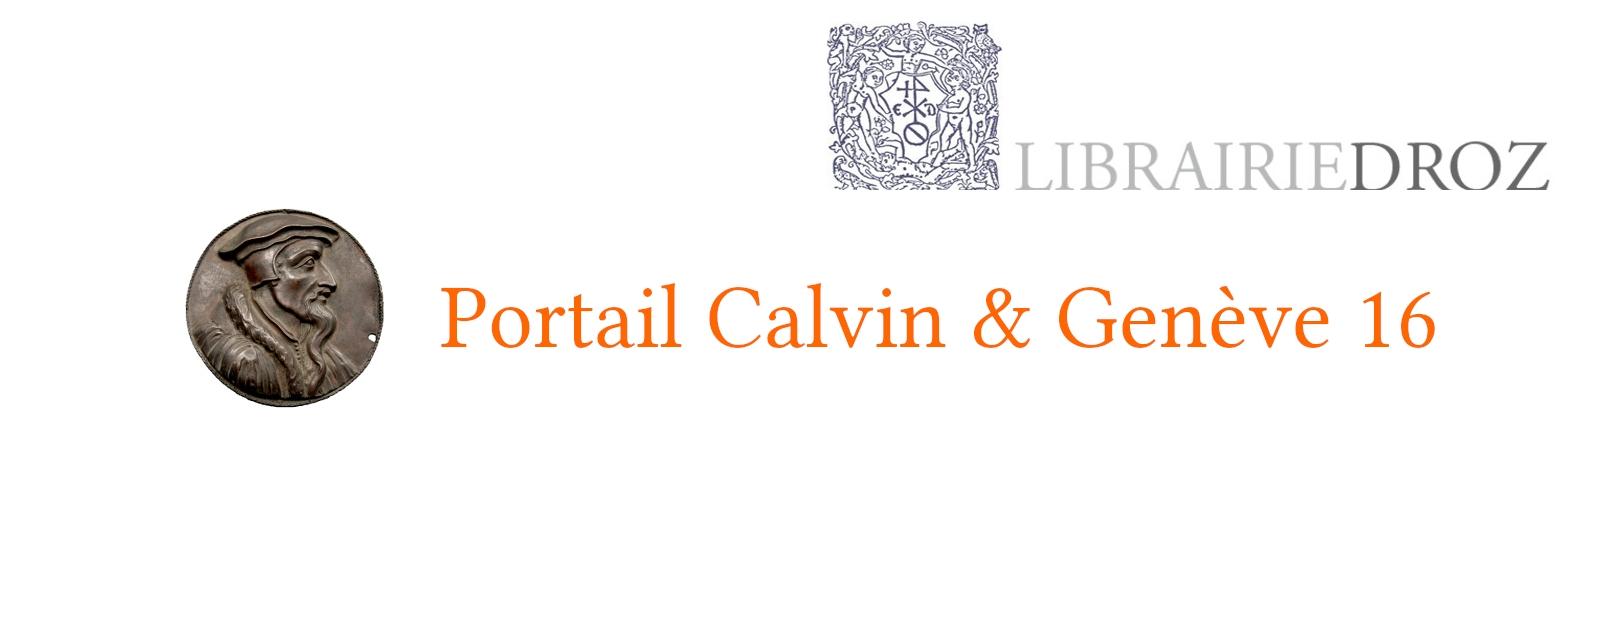 Portail Calvin & Genève 16